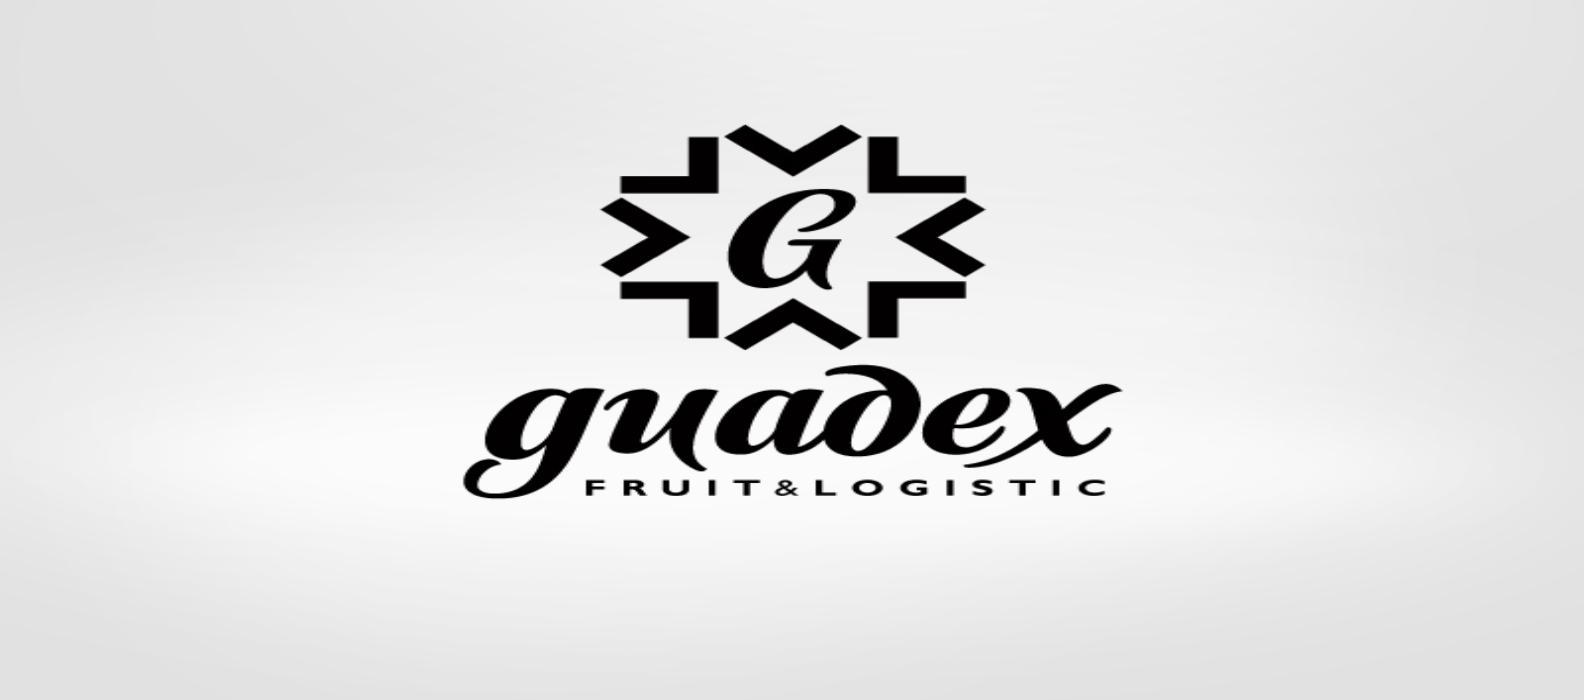 guadex fruit logistic